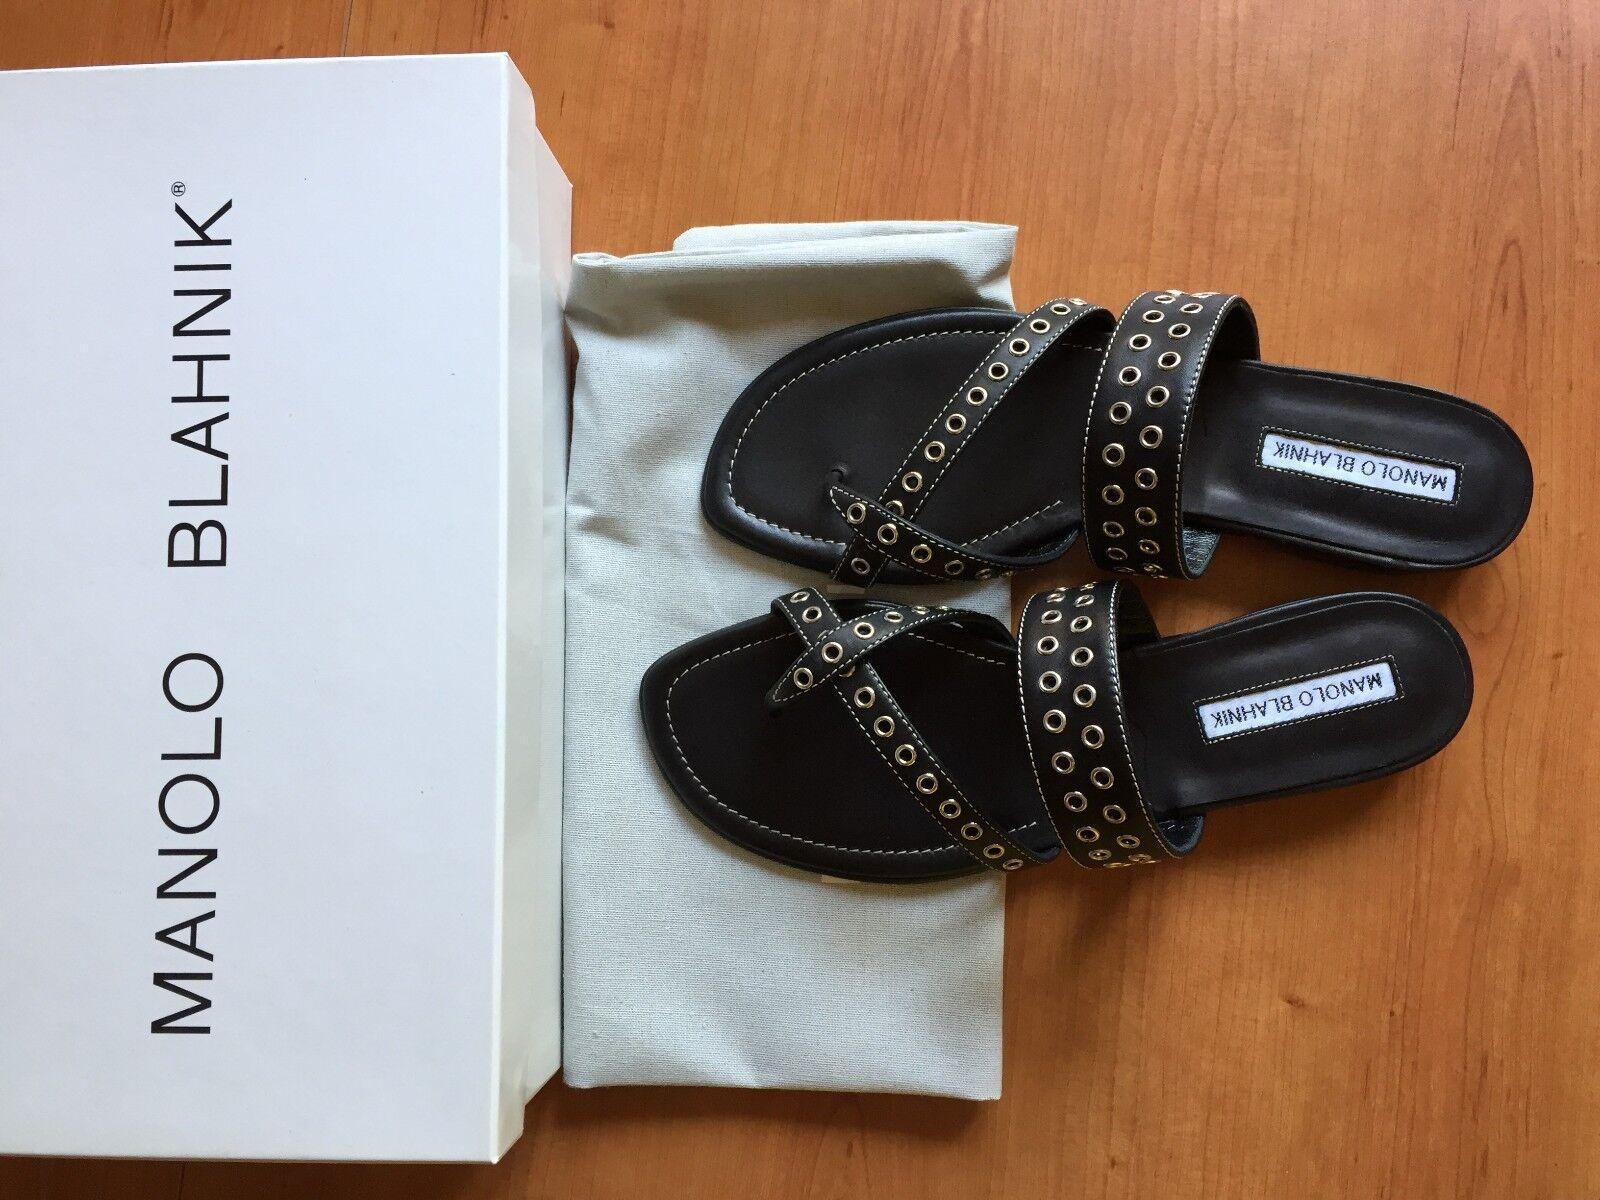 Manolo blahnik sandalias tira dedo flip flop susaocc nuevo embalaje original dustbag